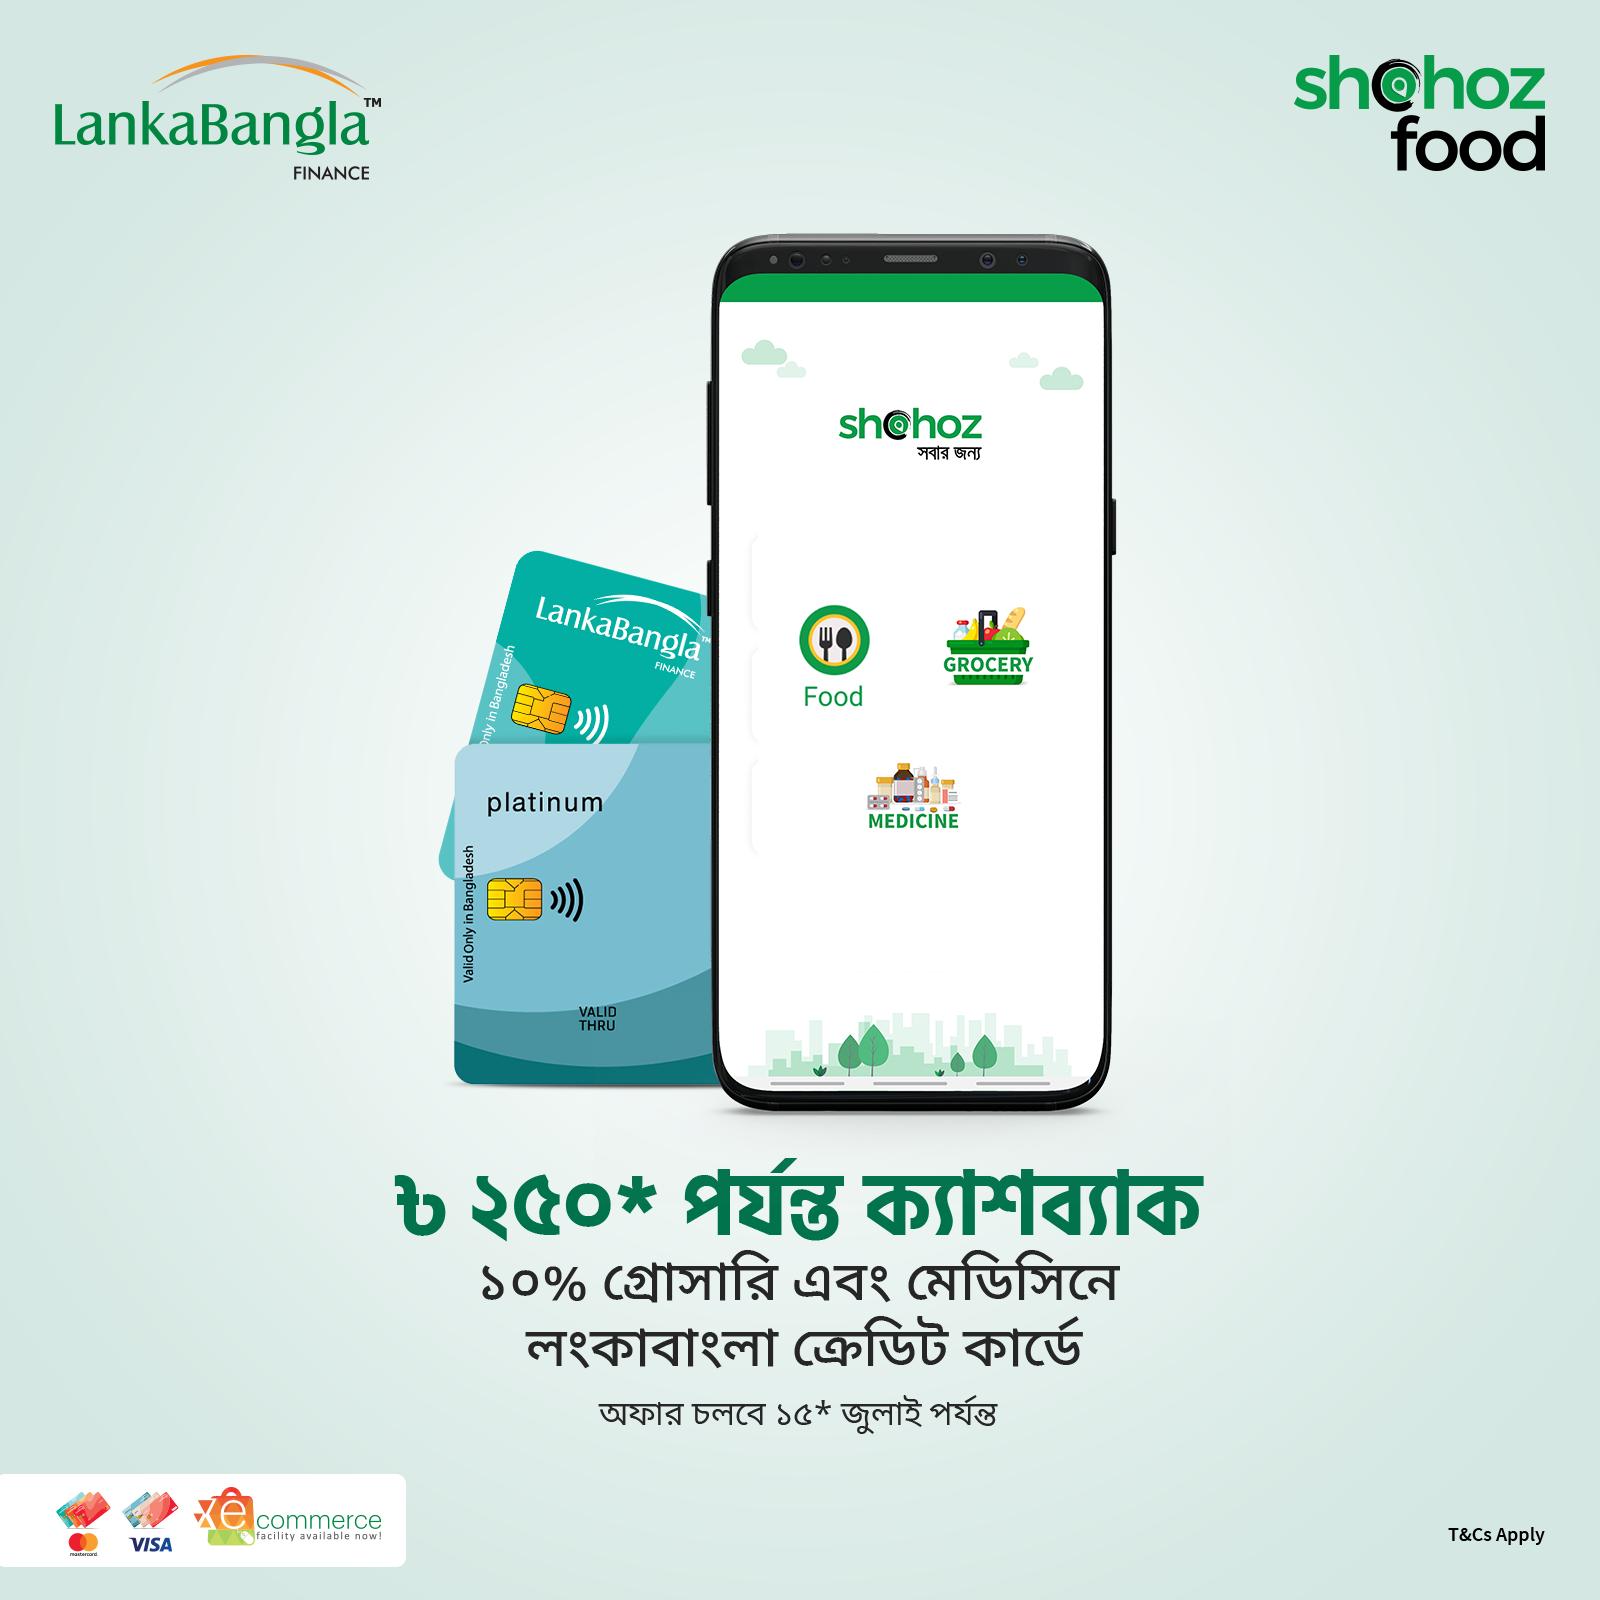 Shohoz Food lankabangla cashback offer